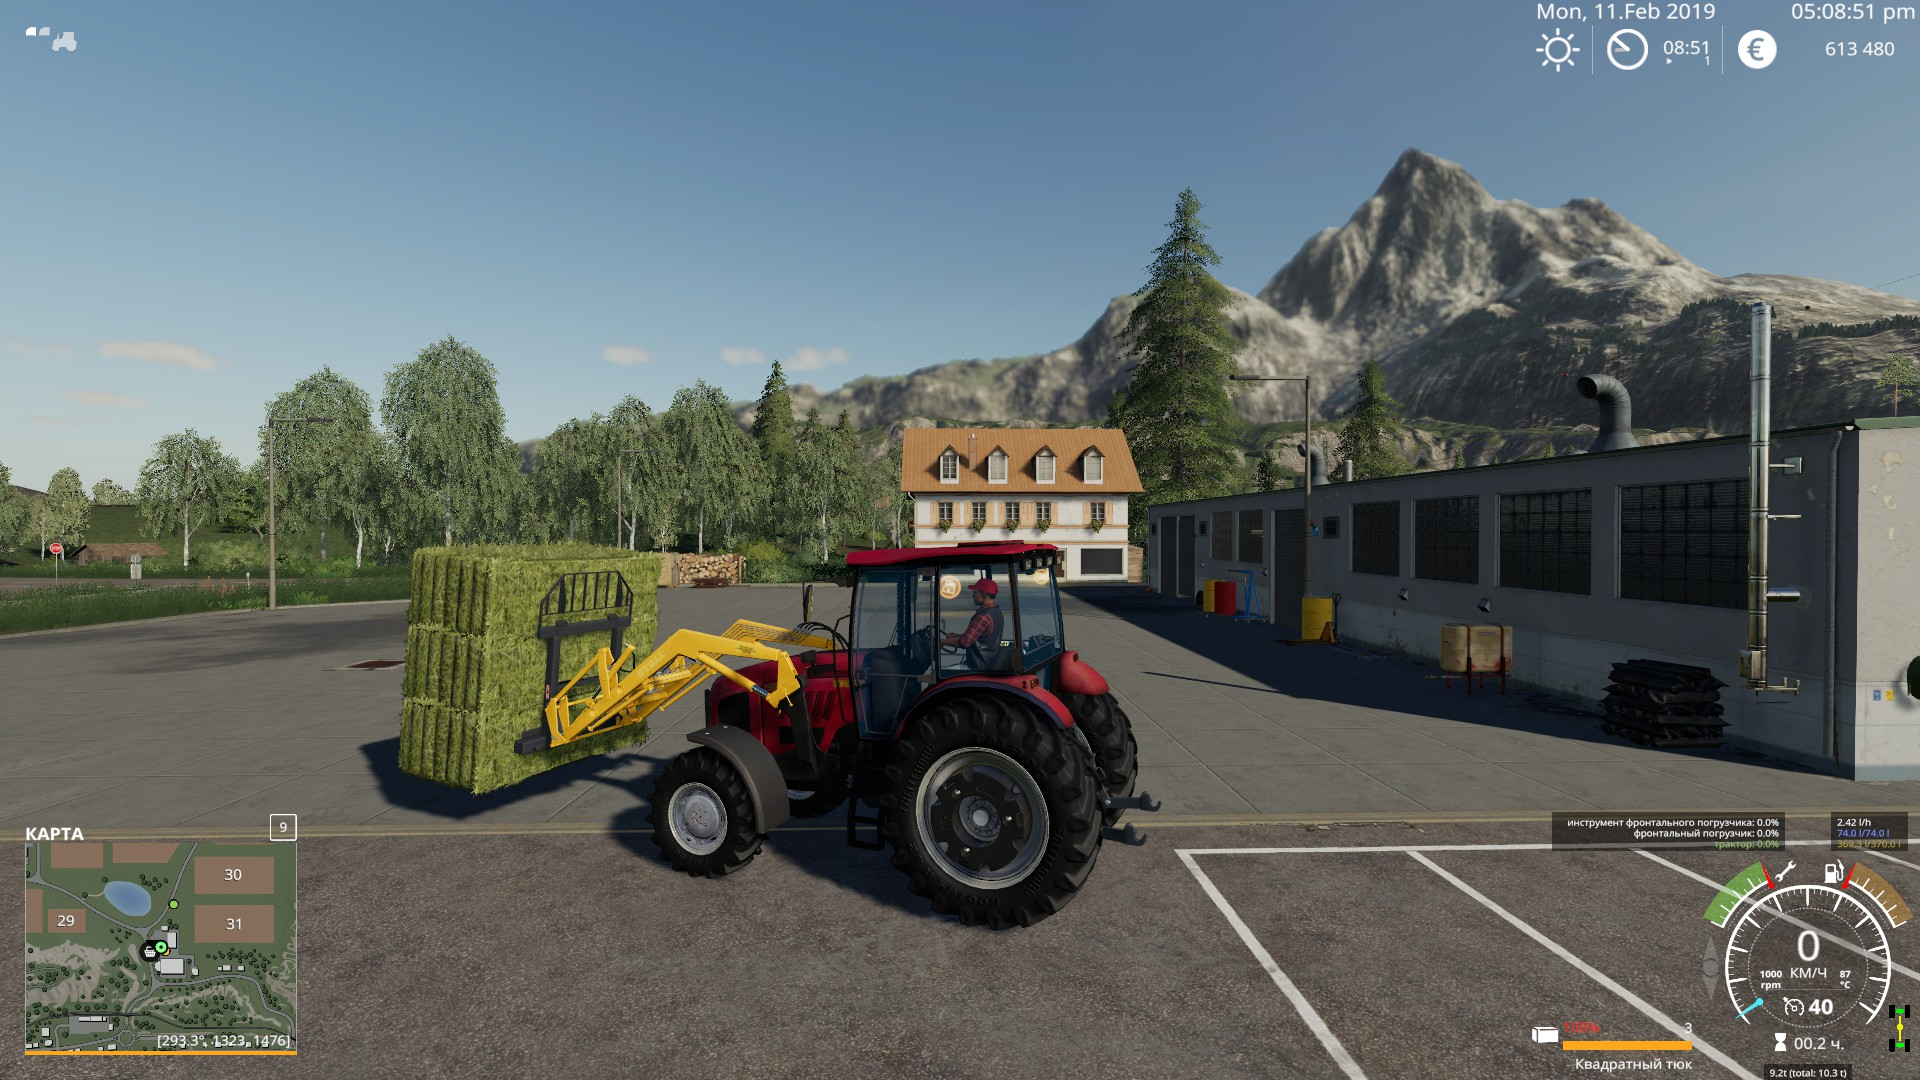 БЕЛАРУС МТЗ-2022 В КУН V1.3.1 для Farming Simulator 2019